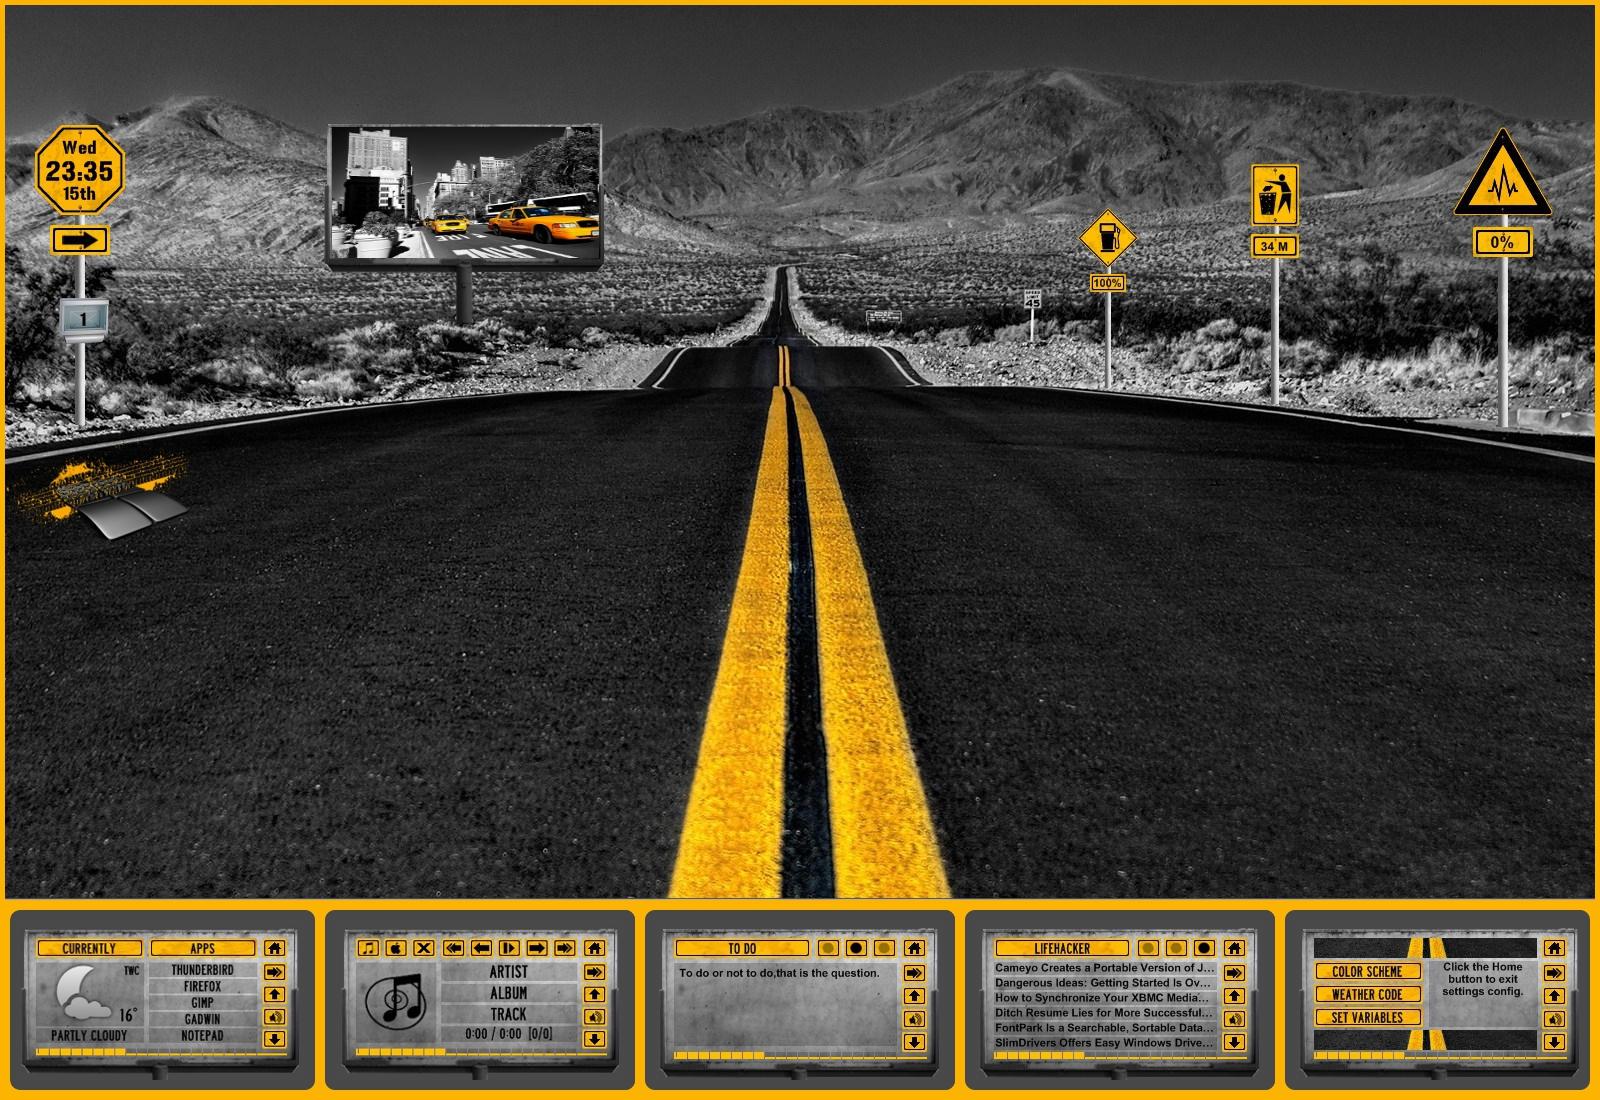 Road Kill by Jkon00